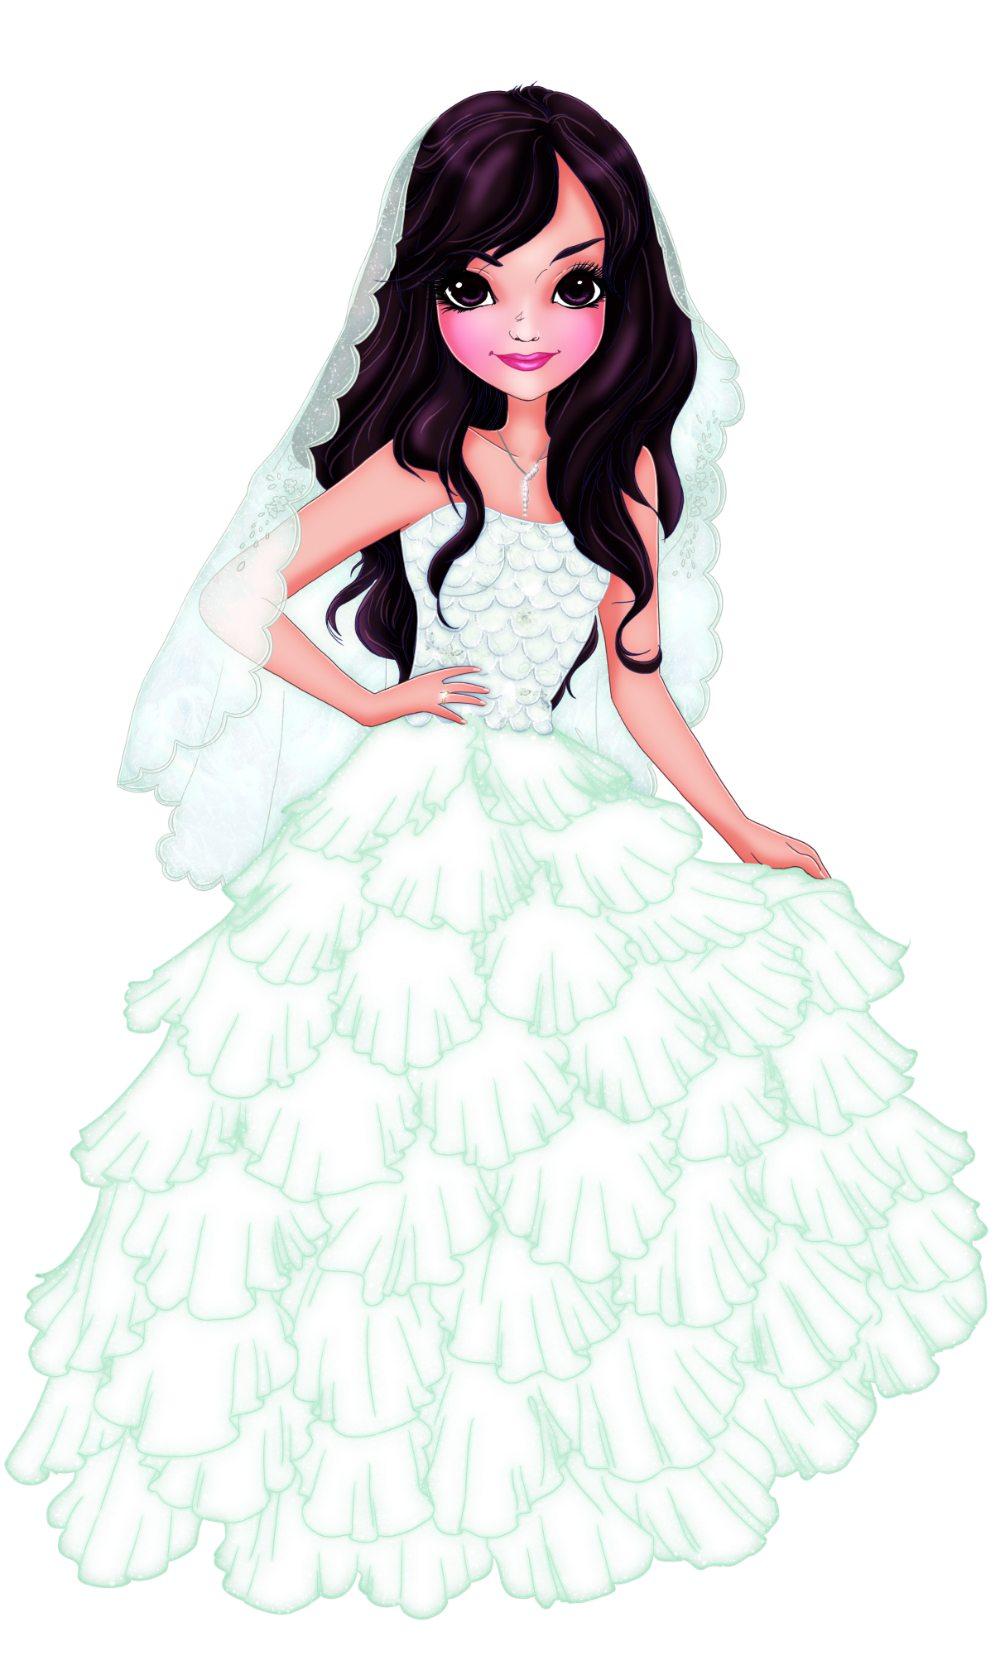 Fashion Illustration Portrait of a Bride by Elisa Moriconi via ArtCorgi